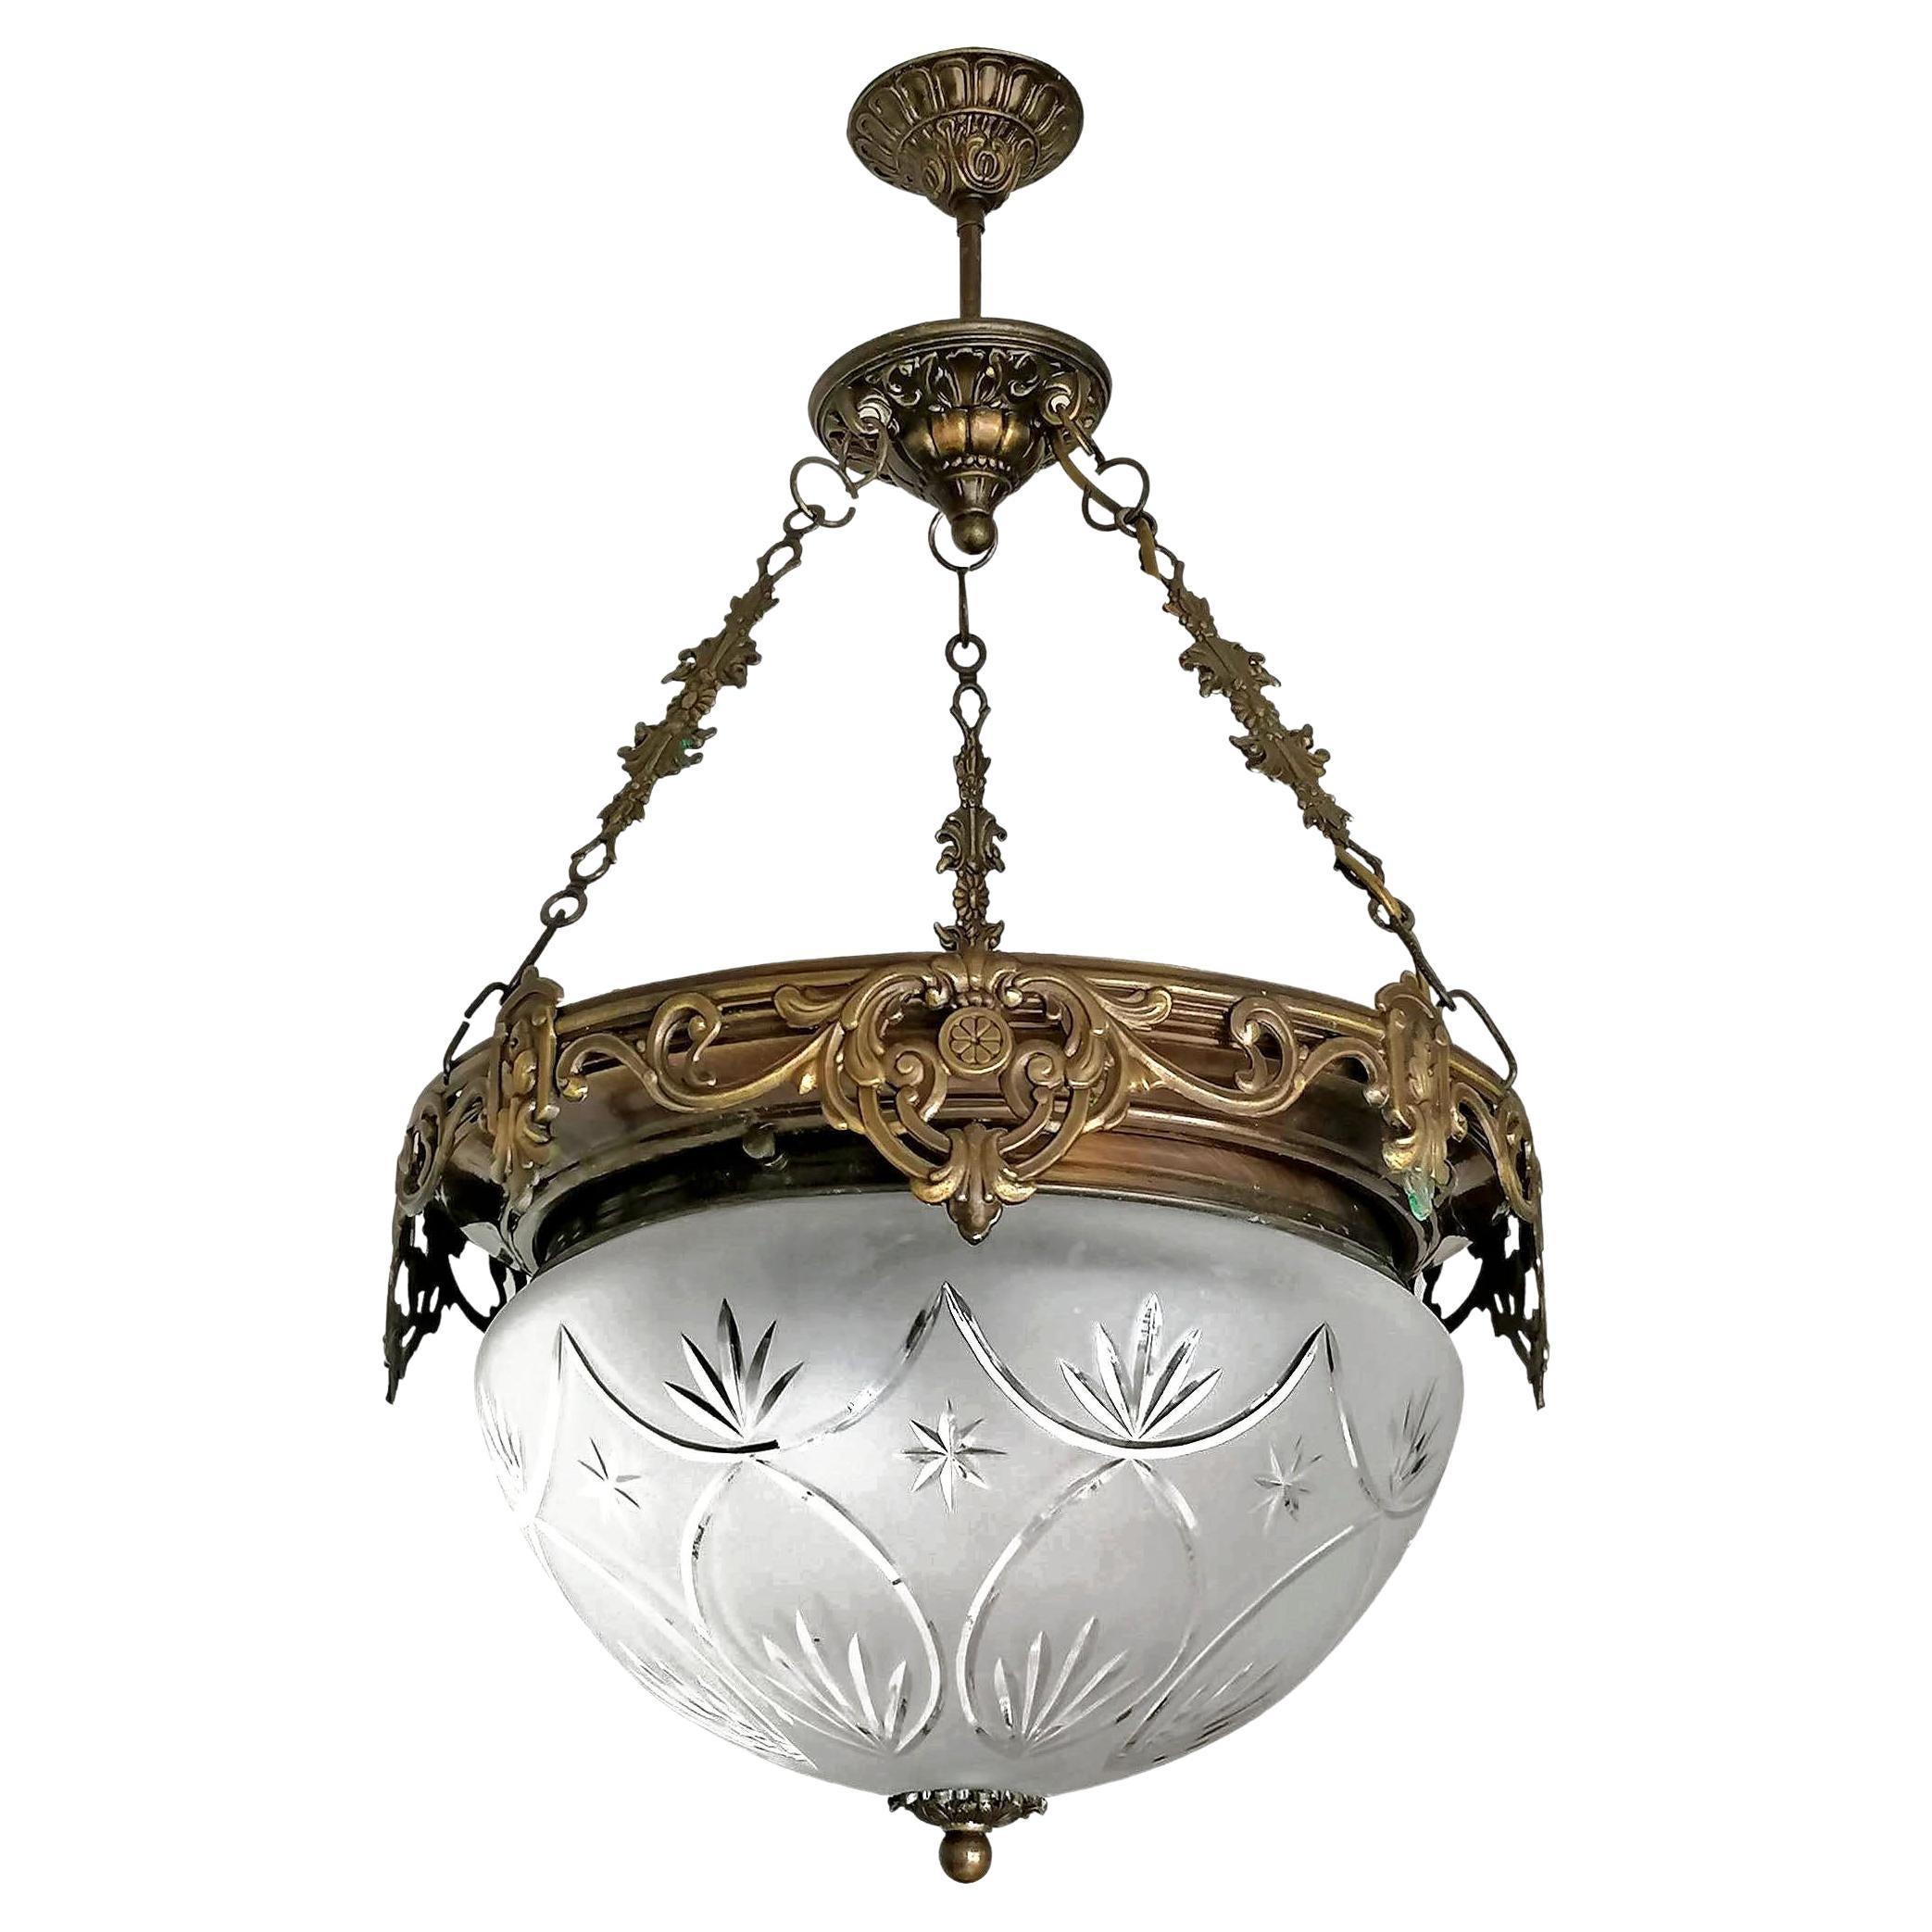 Large French Art Nouveau Art Deco Ornate Burnished Brass & Cut Glass Chandelier